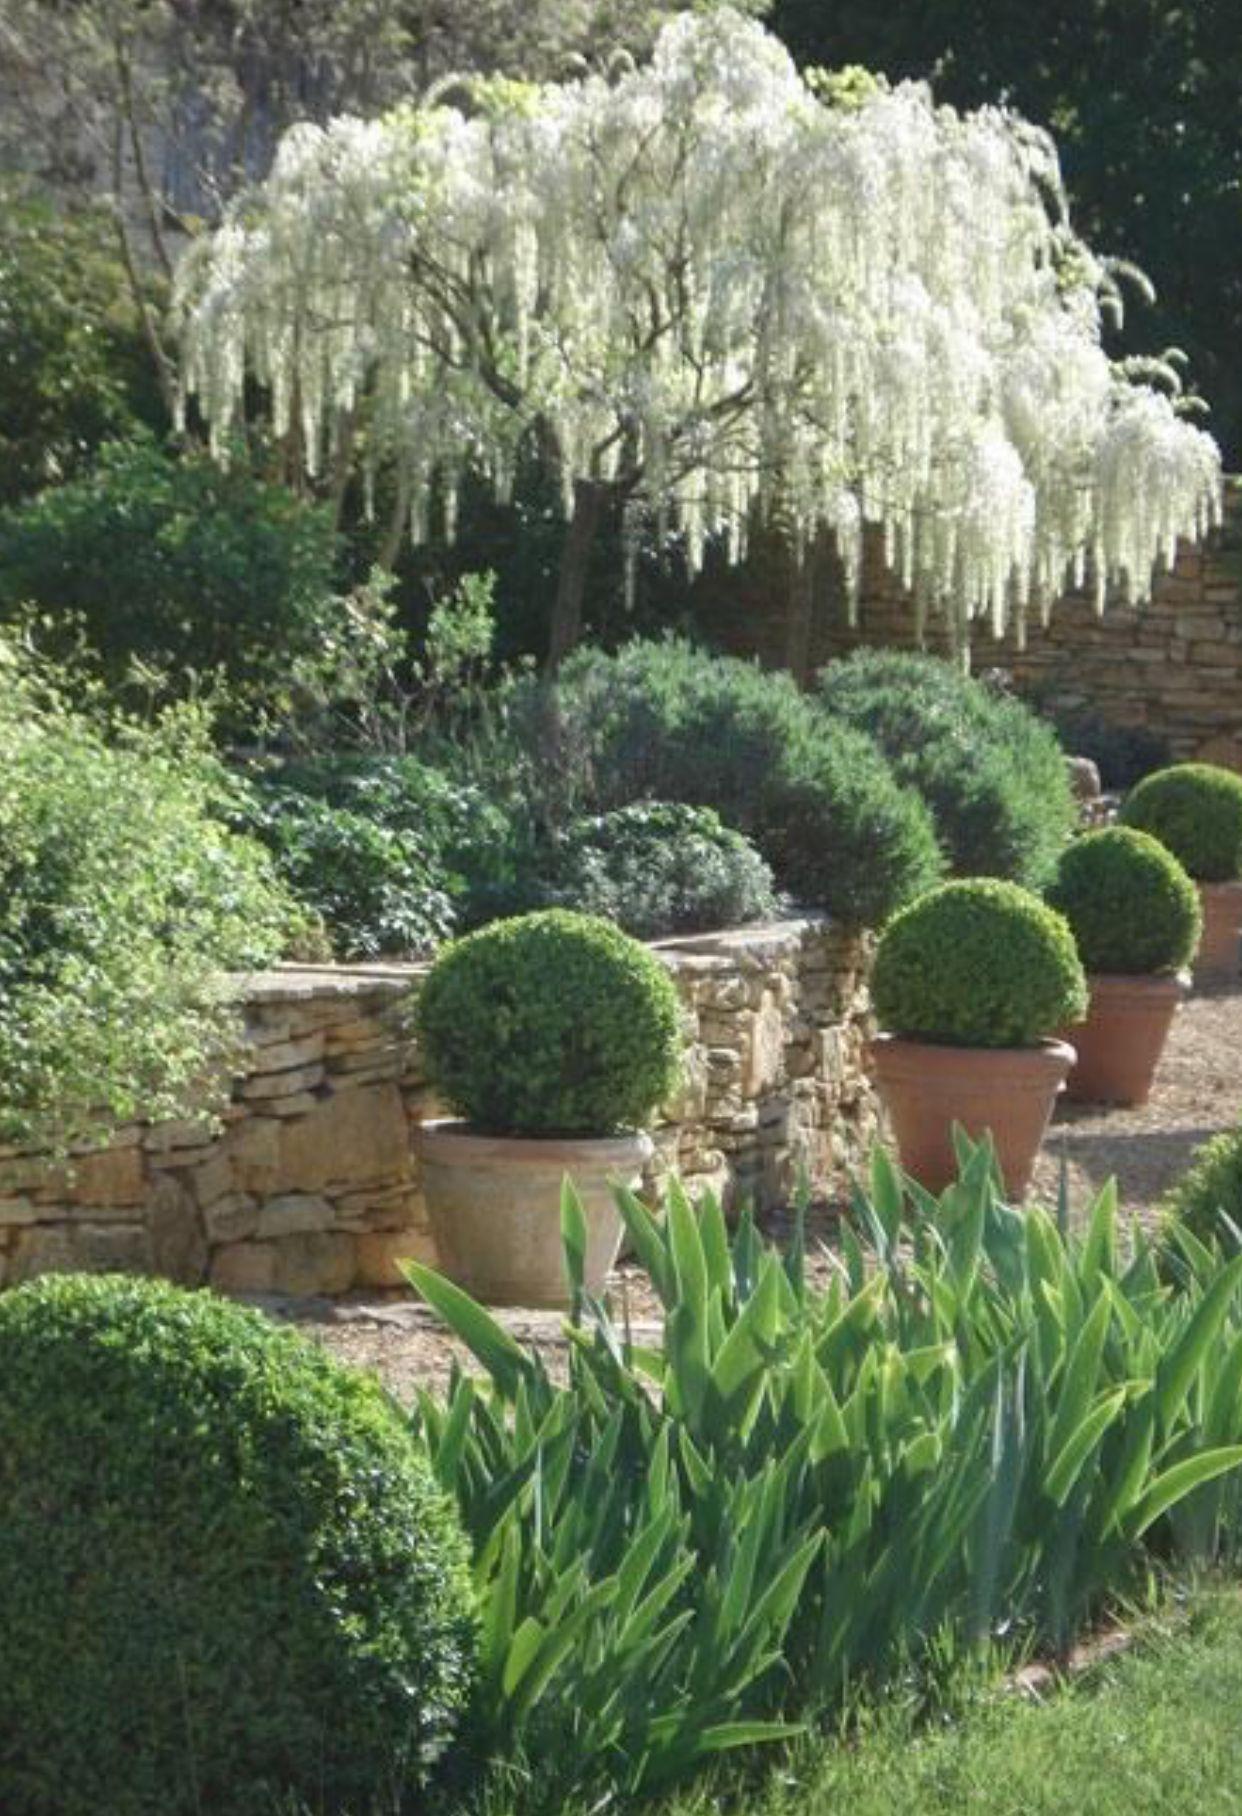 Épinglé Par Jeannette Schweizer Sur Garten | Jardin ... dedans Amenagement Petit Jardin Mediterraneen